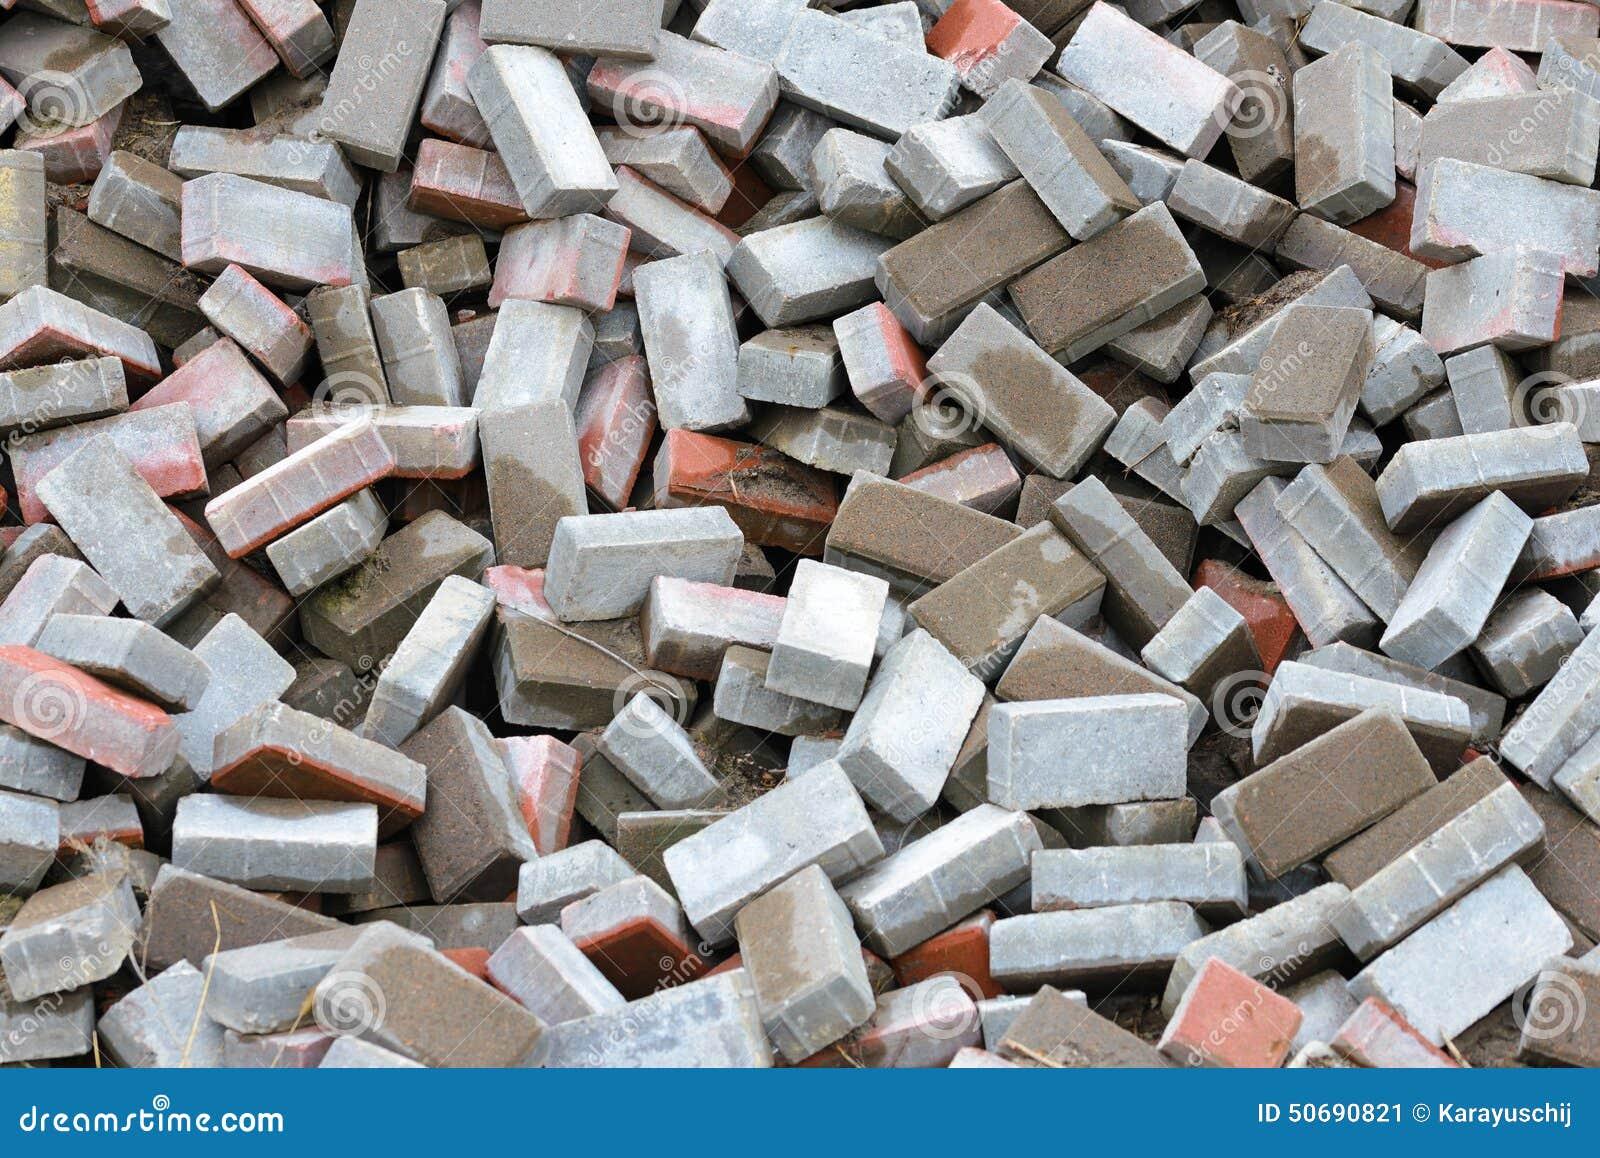 Download 砖堆 库存图片. 图片 包括有 堆积, 封锁, 布琼布拉, 拱道, 颜色, 橙色, 红色, 建筑, browne - 50690821